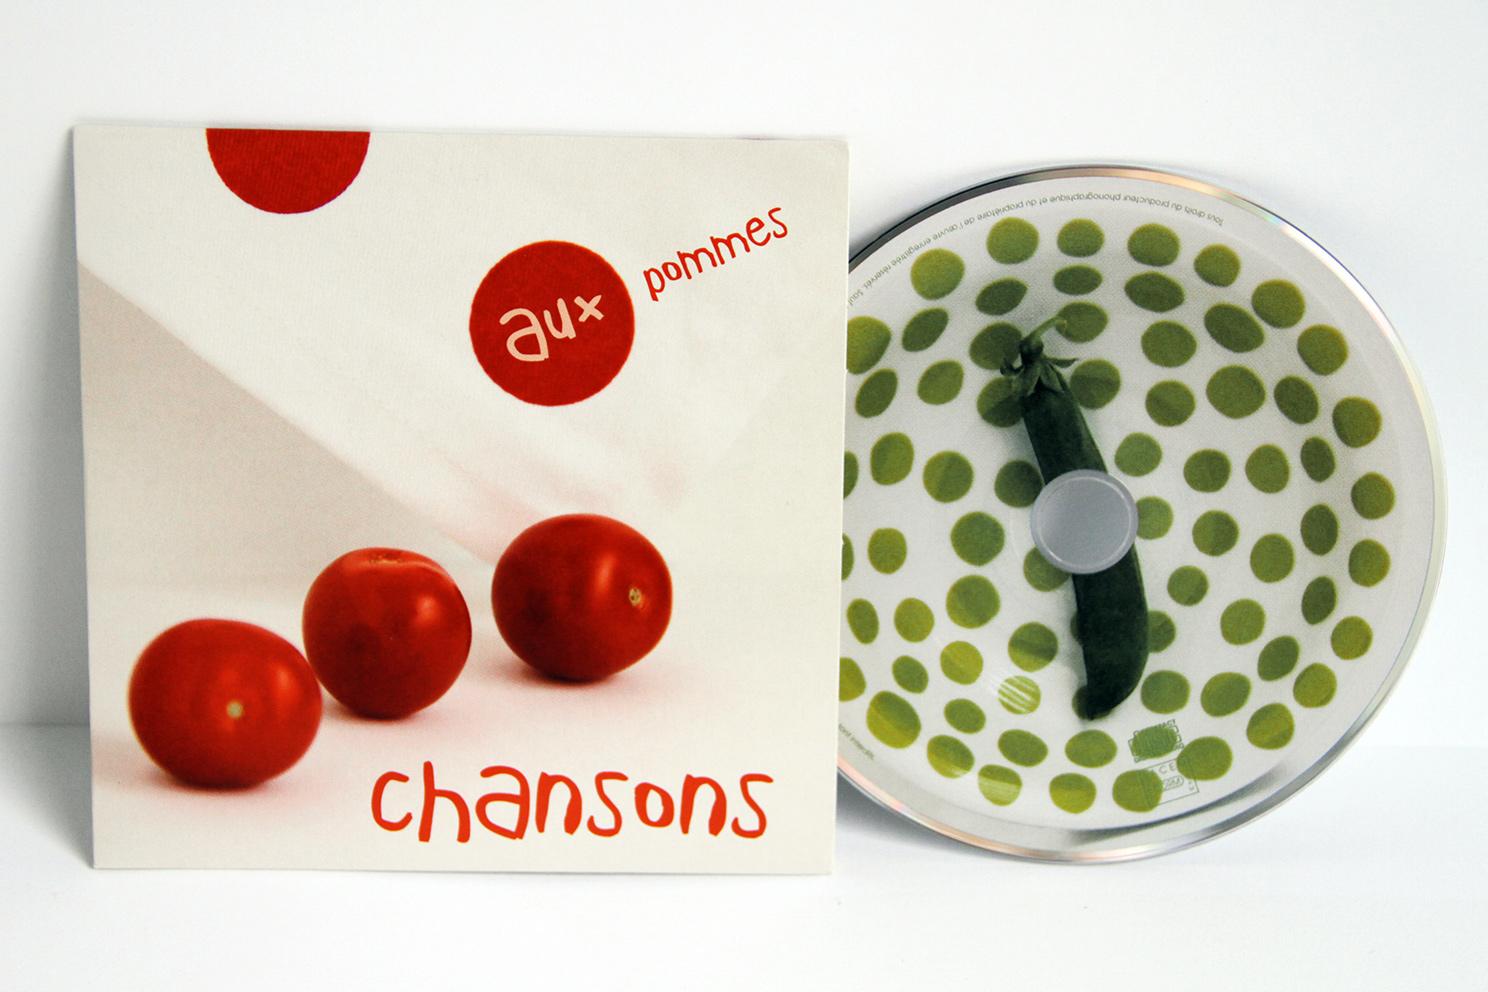 CHANSONS_POMMES_CD